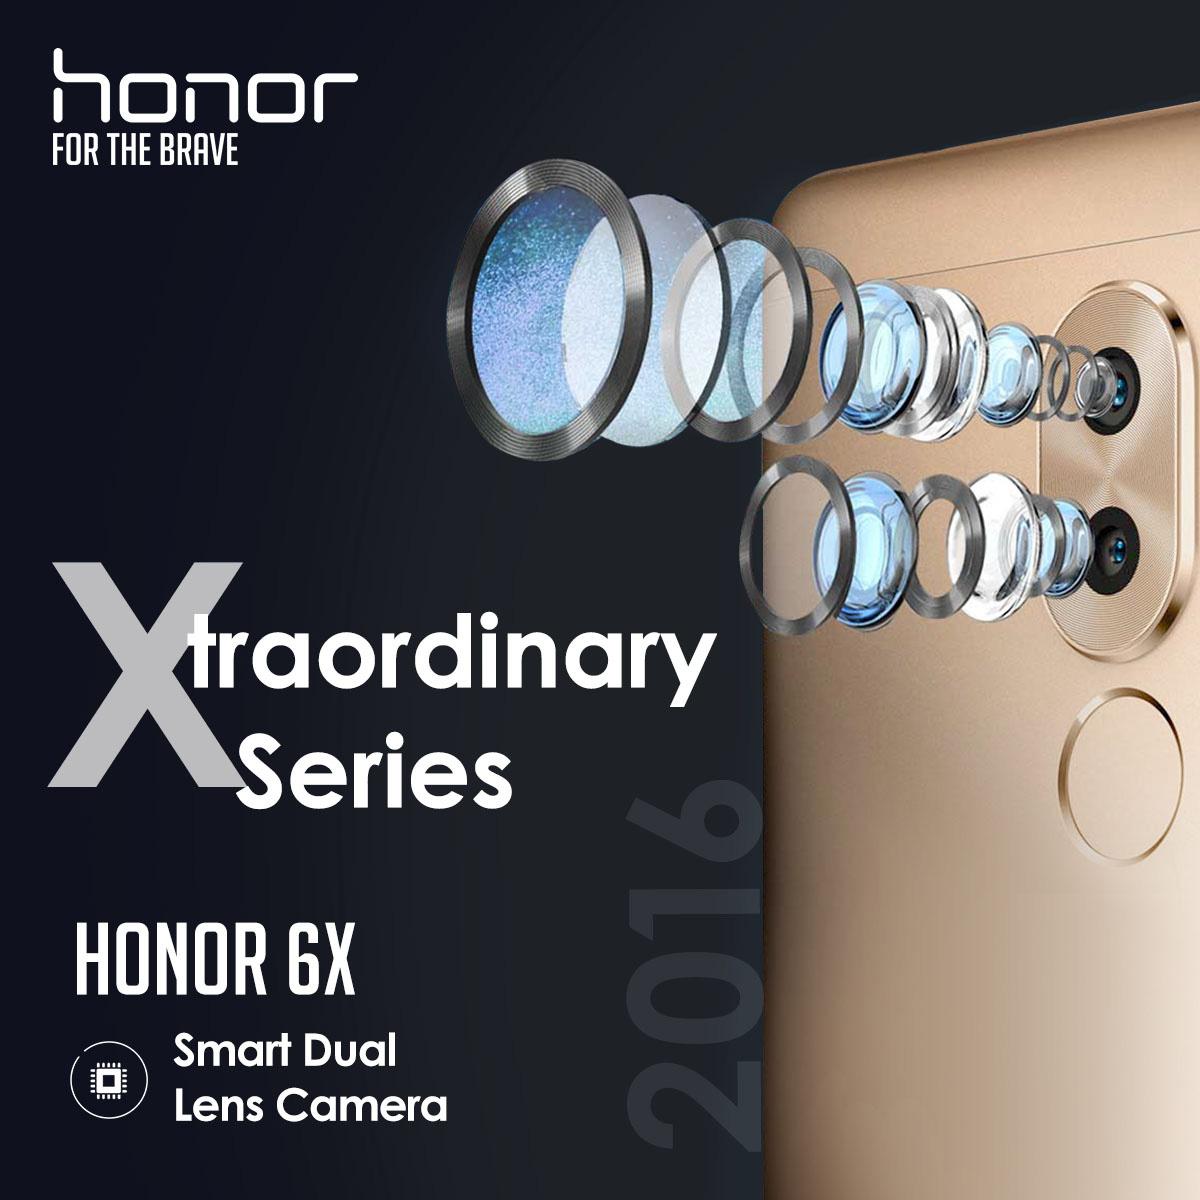 news-honor6x-img.jpg